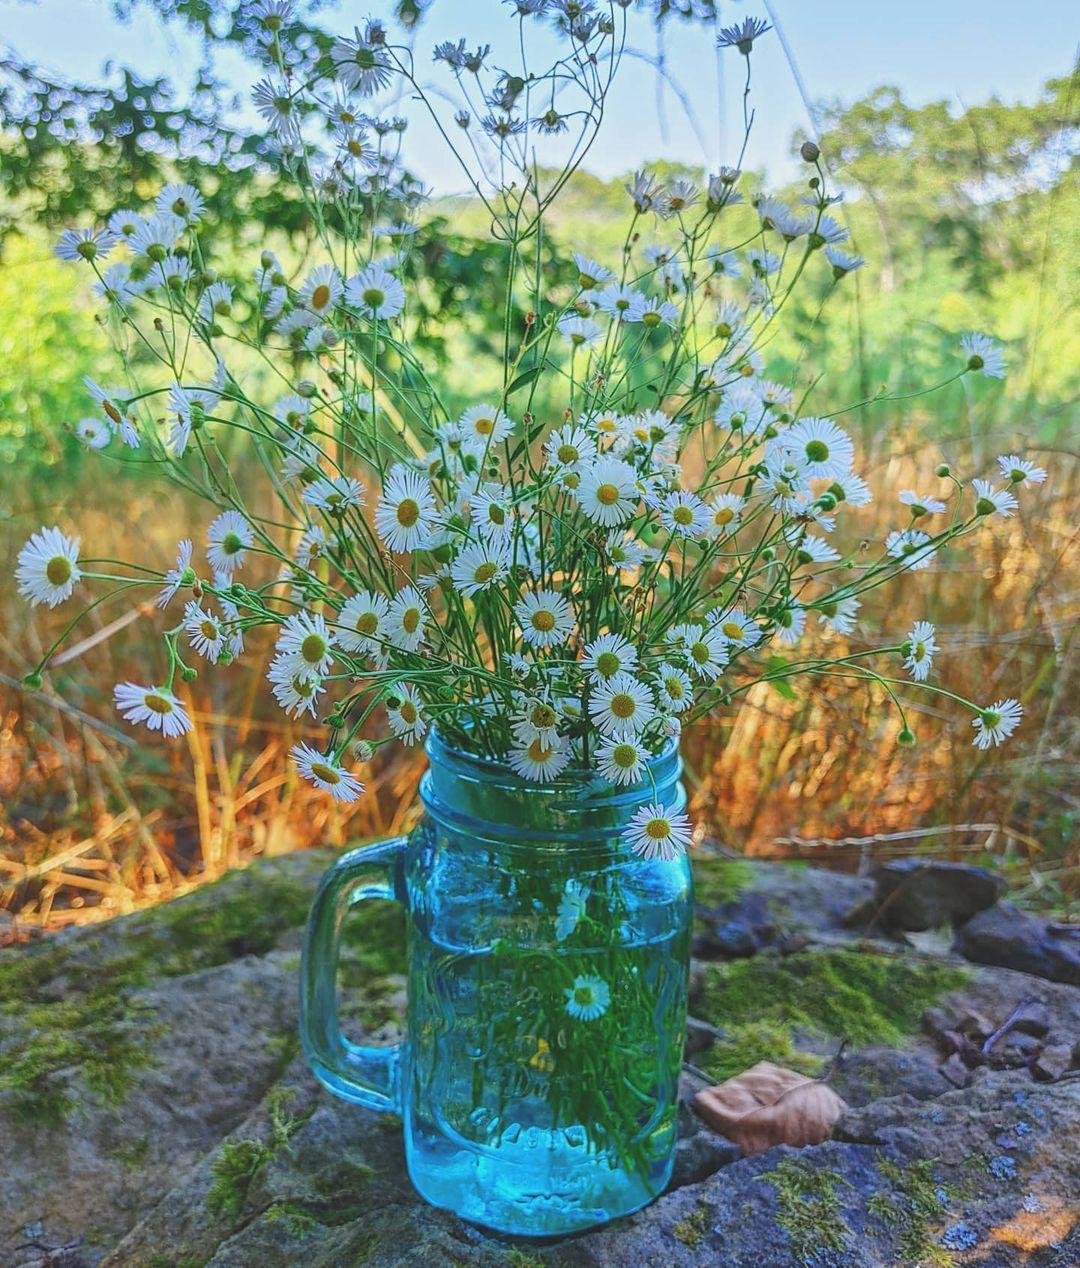 Daisy Bouquet in Mason Jar